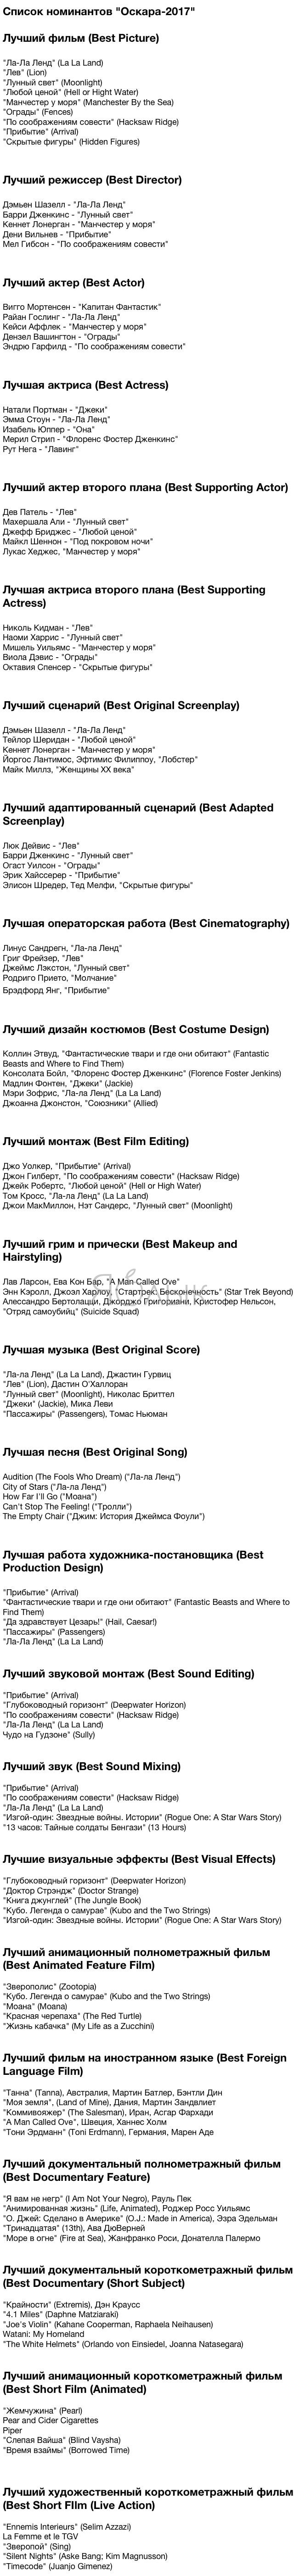 Номинанты на премию Оскар 2017